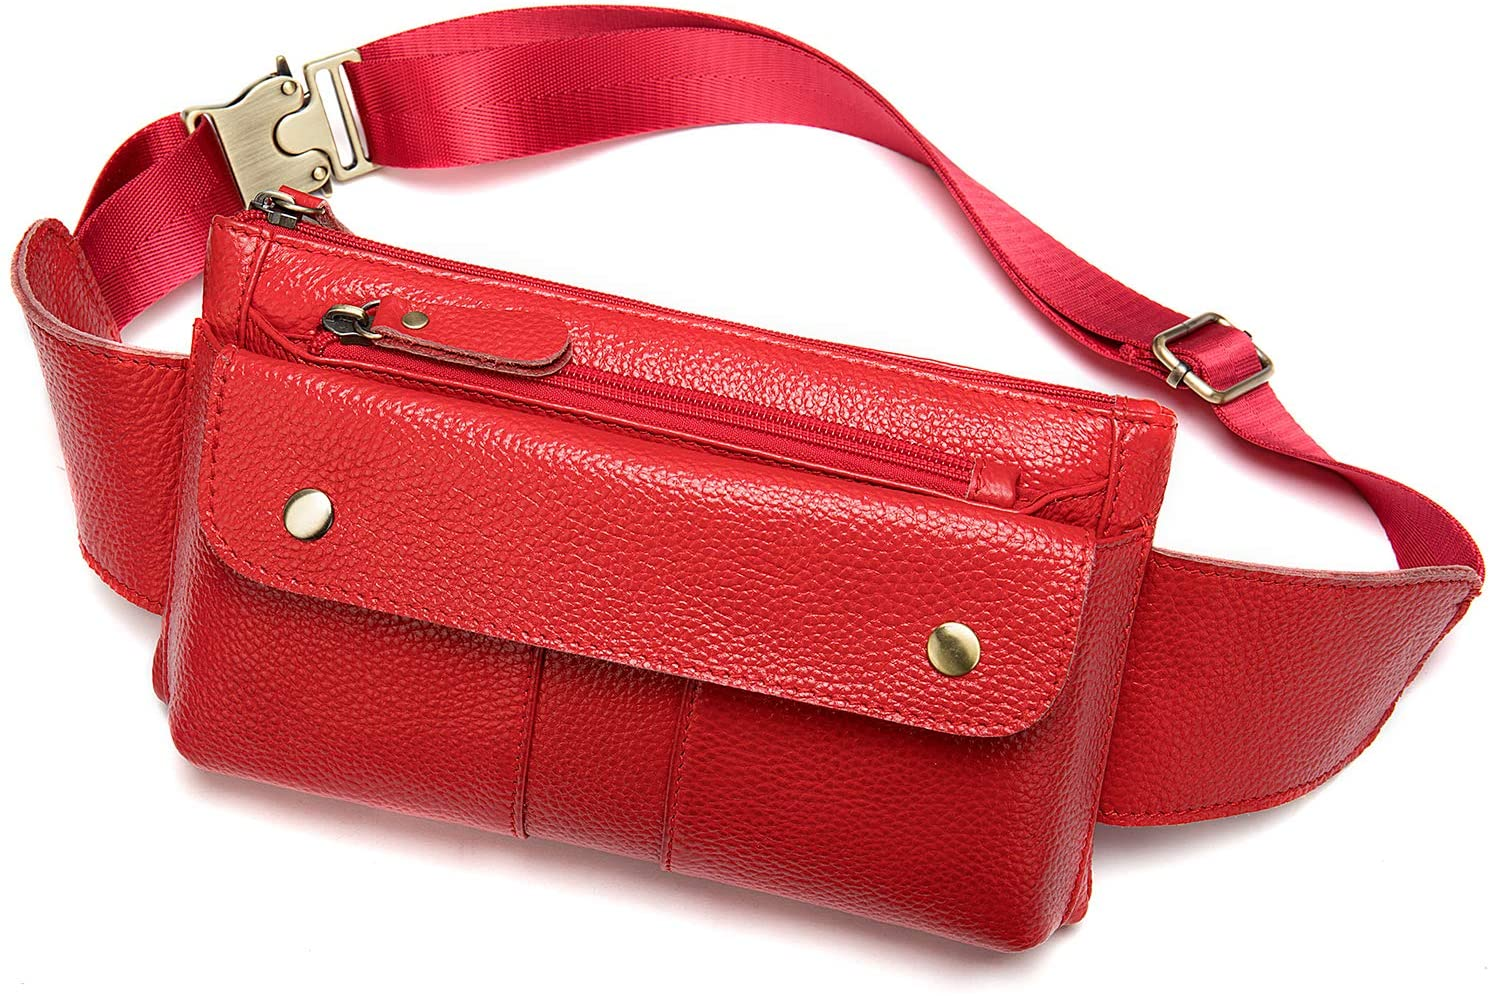 Fashionable Genuine Leather Fanny Pack Slim Waist Bag with Adjustable Belt Strap Red